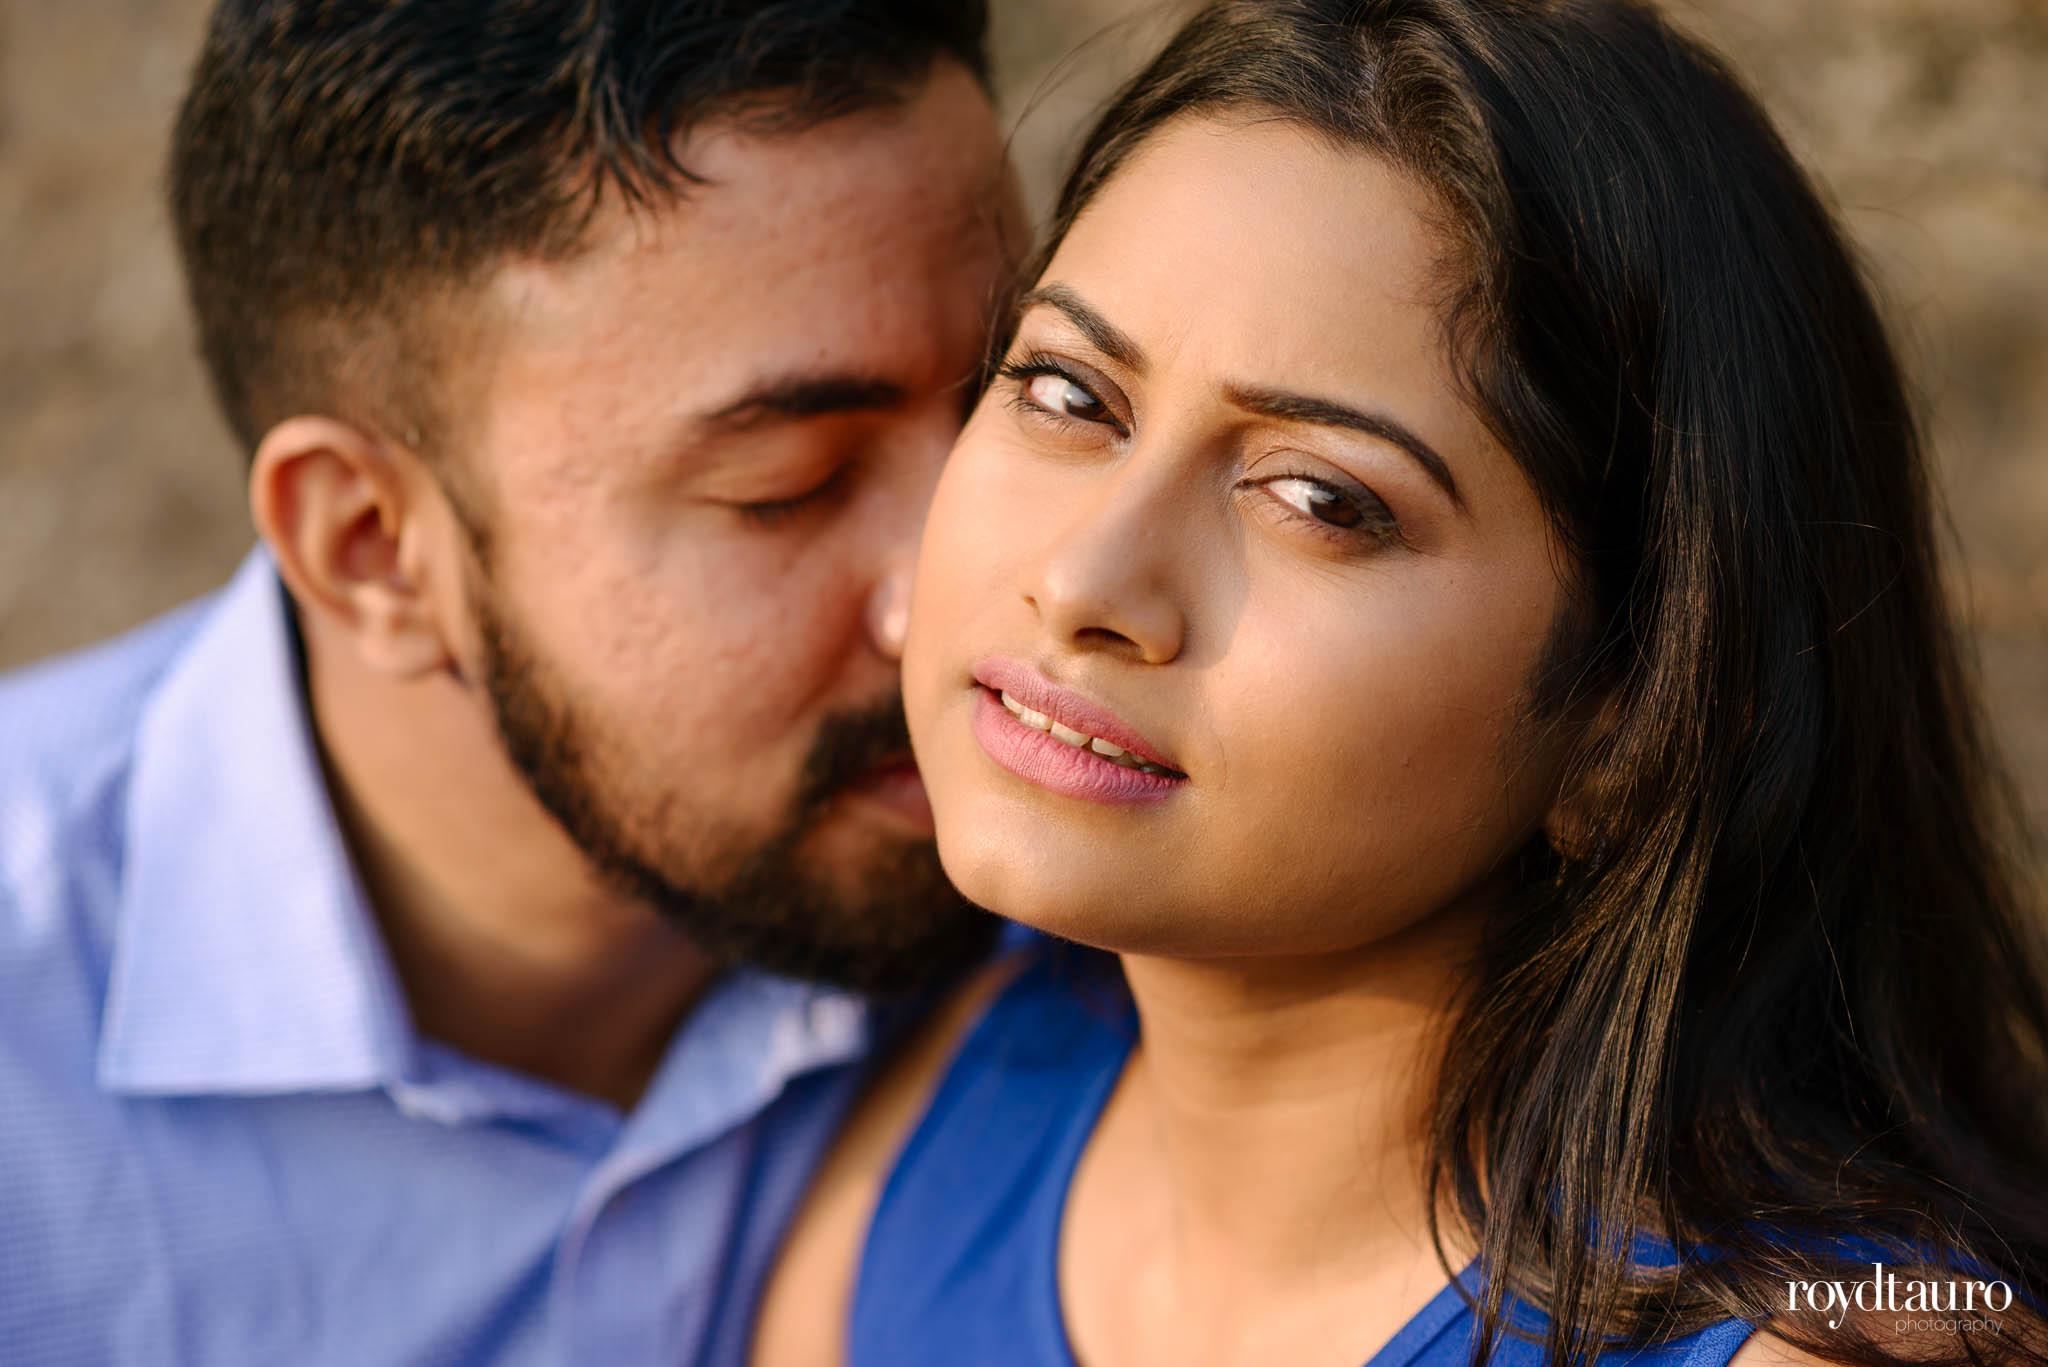 Kim-Rahul-Prewedding-12.jpg